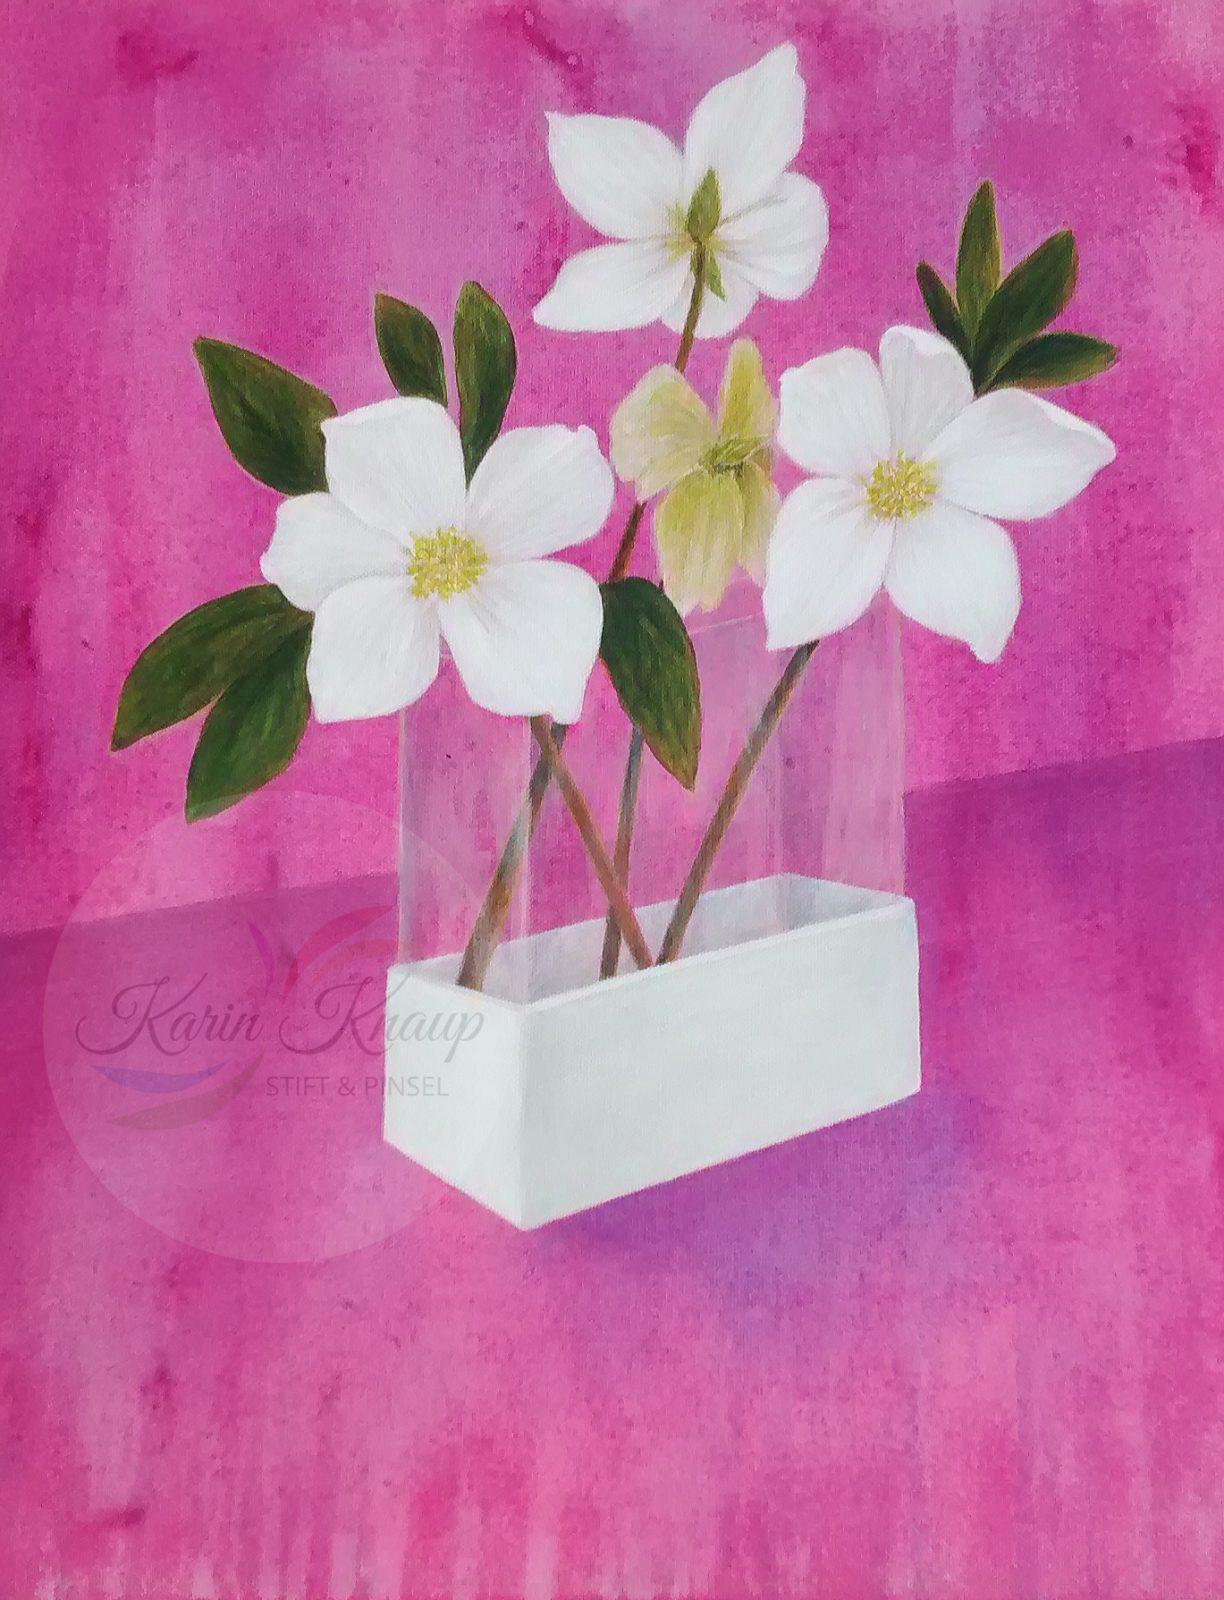 Christrosen - Acryl auf Leinwand 30 x 40 cm